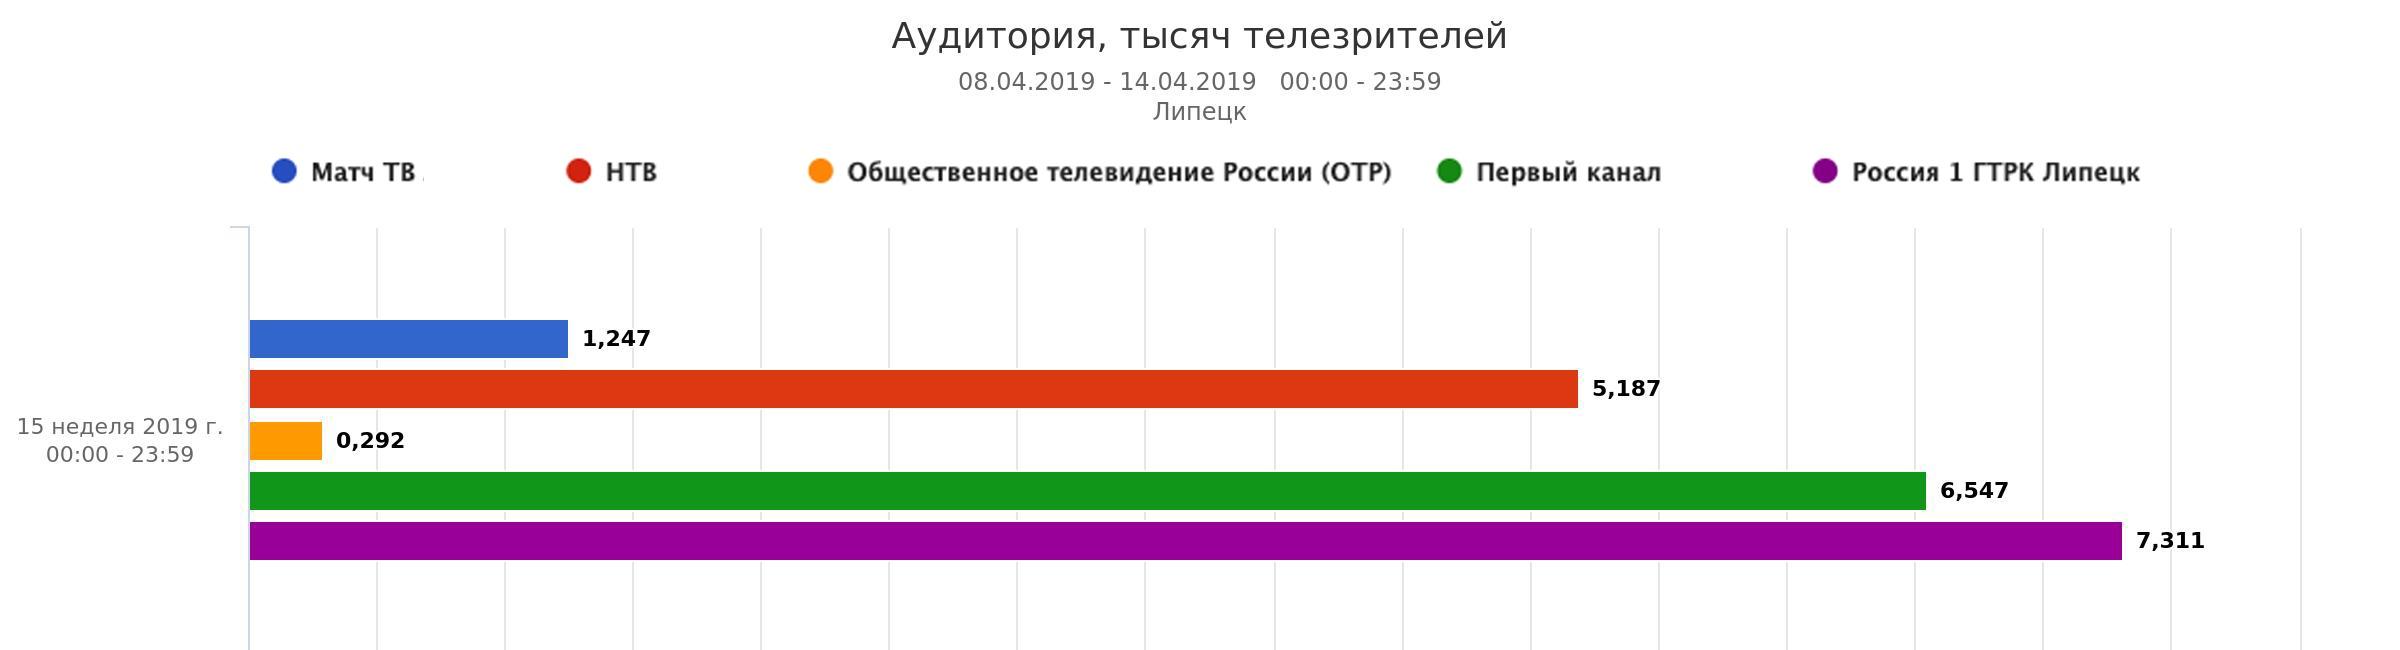 «Россия 1» снова лидер телепроката в Липецкой области — Изображение 1